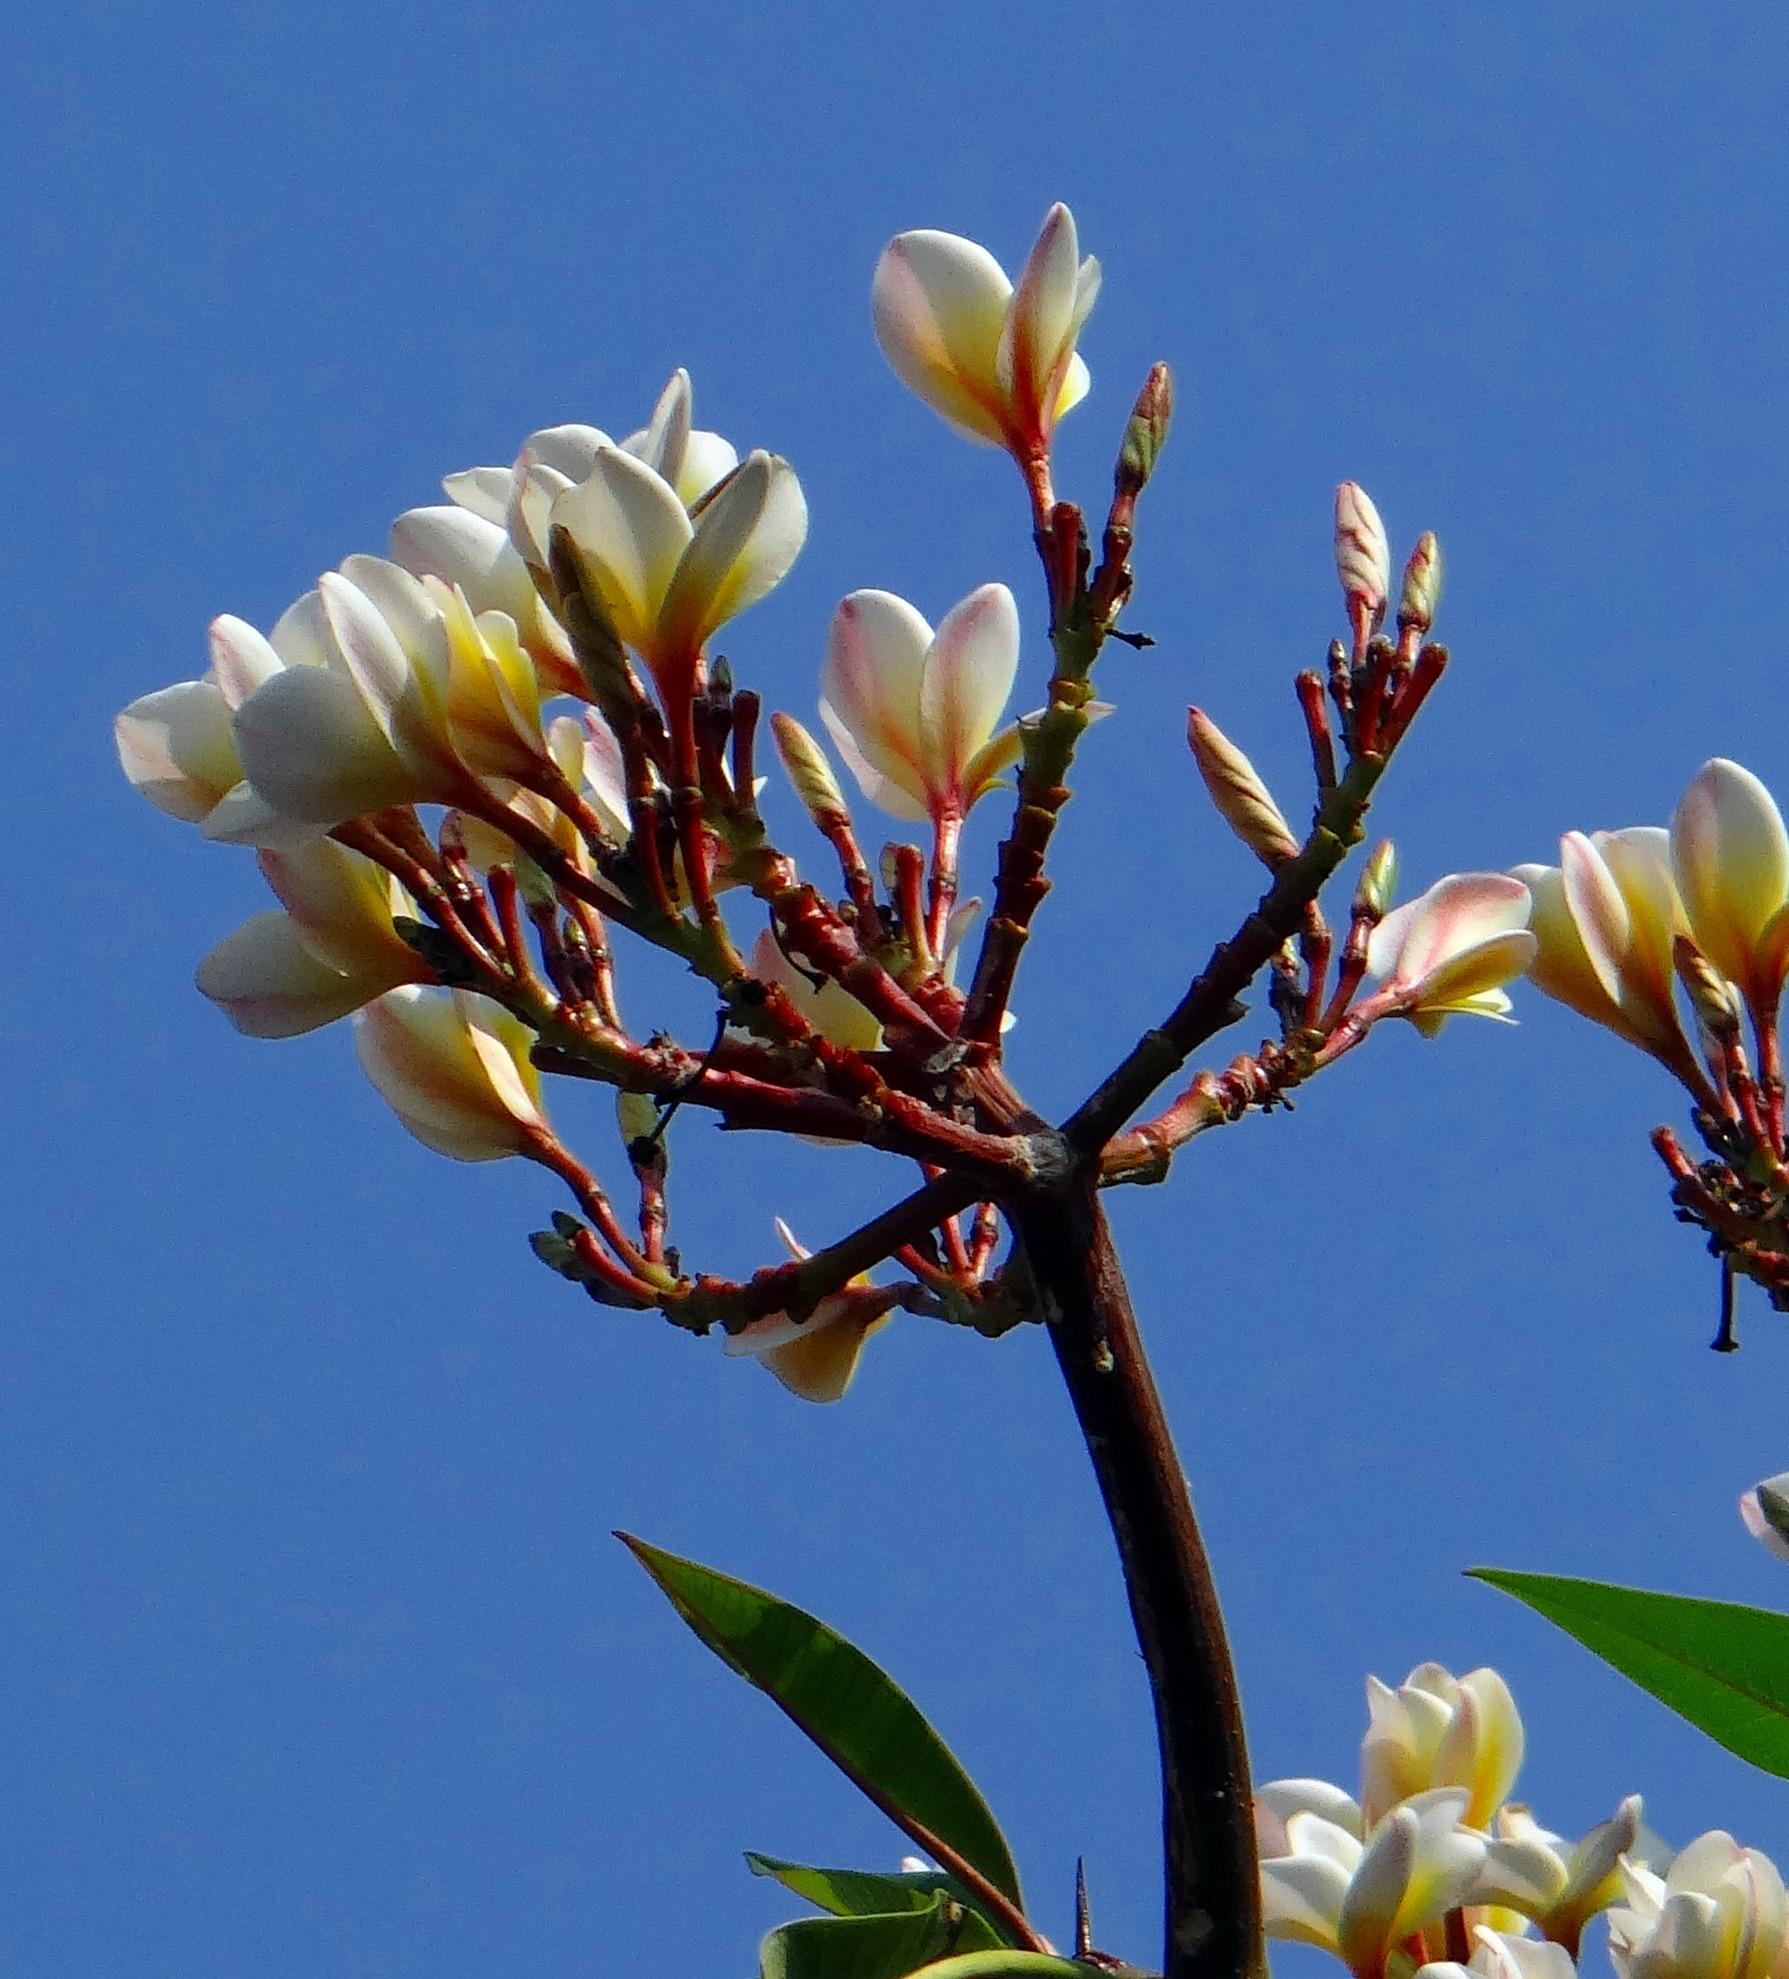 Free Images Tree Branch Blossom White Flower Produce Botany